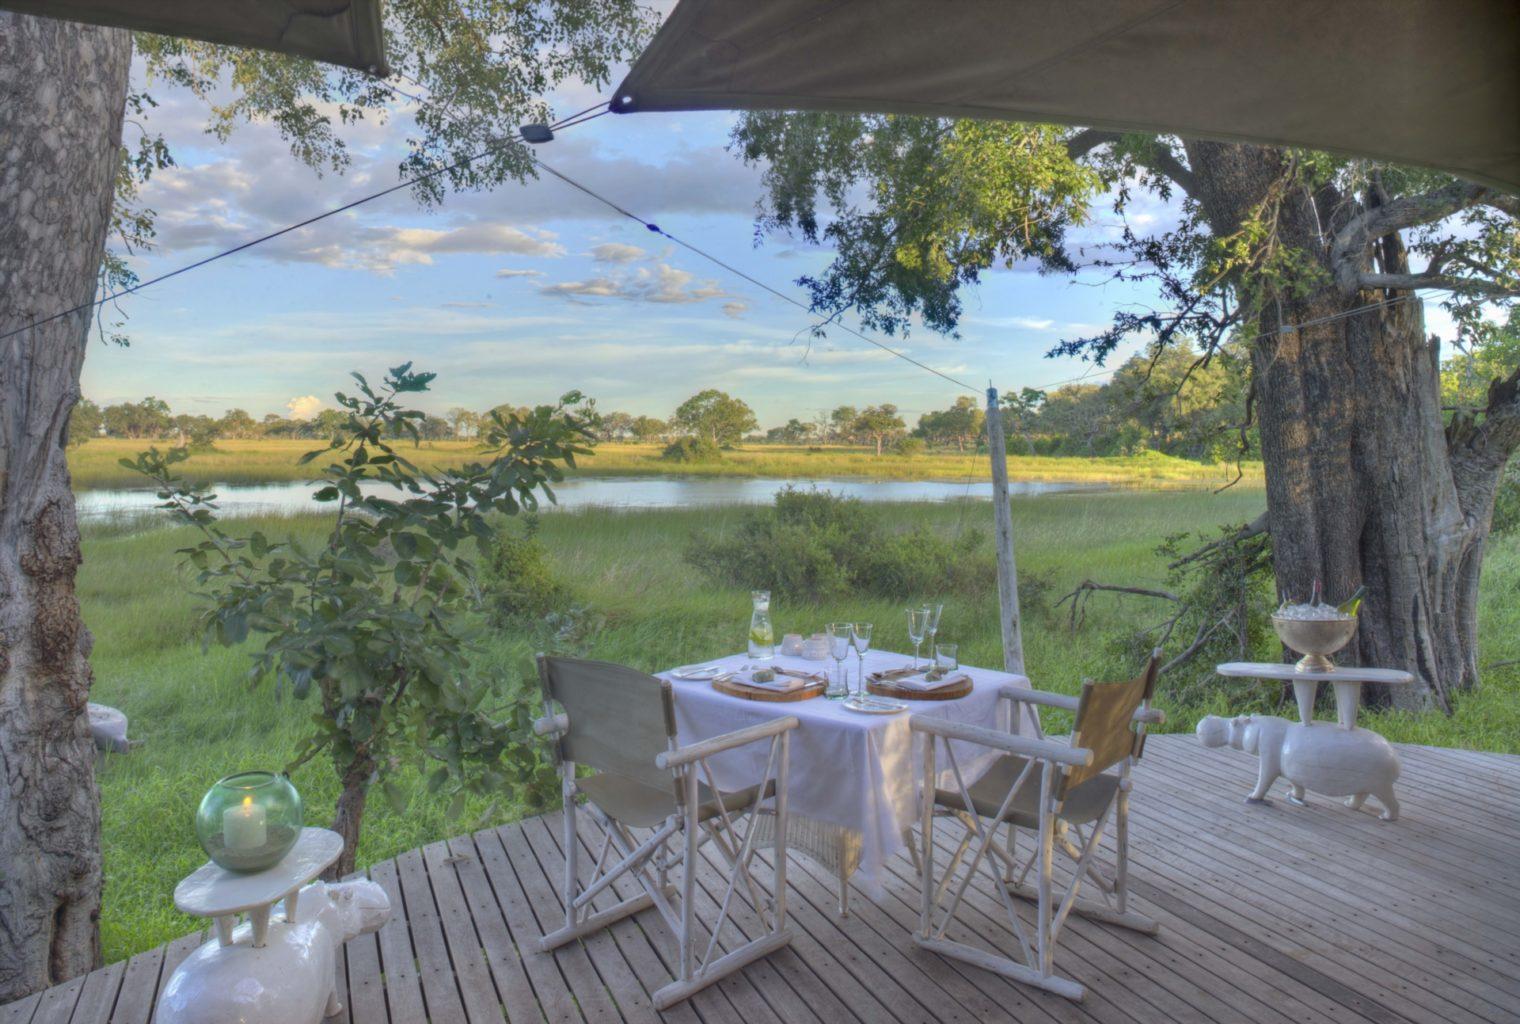 &Beyond, Xaranna, Okavango Delta, Camp, Guest Area Deck